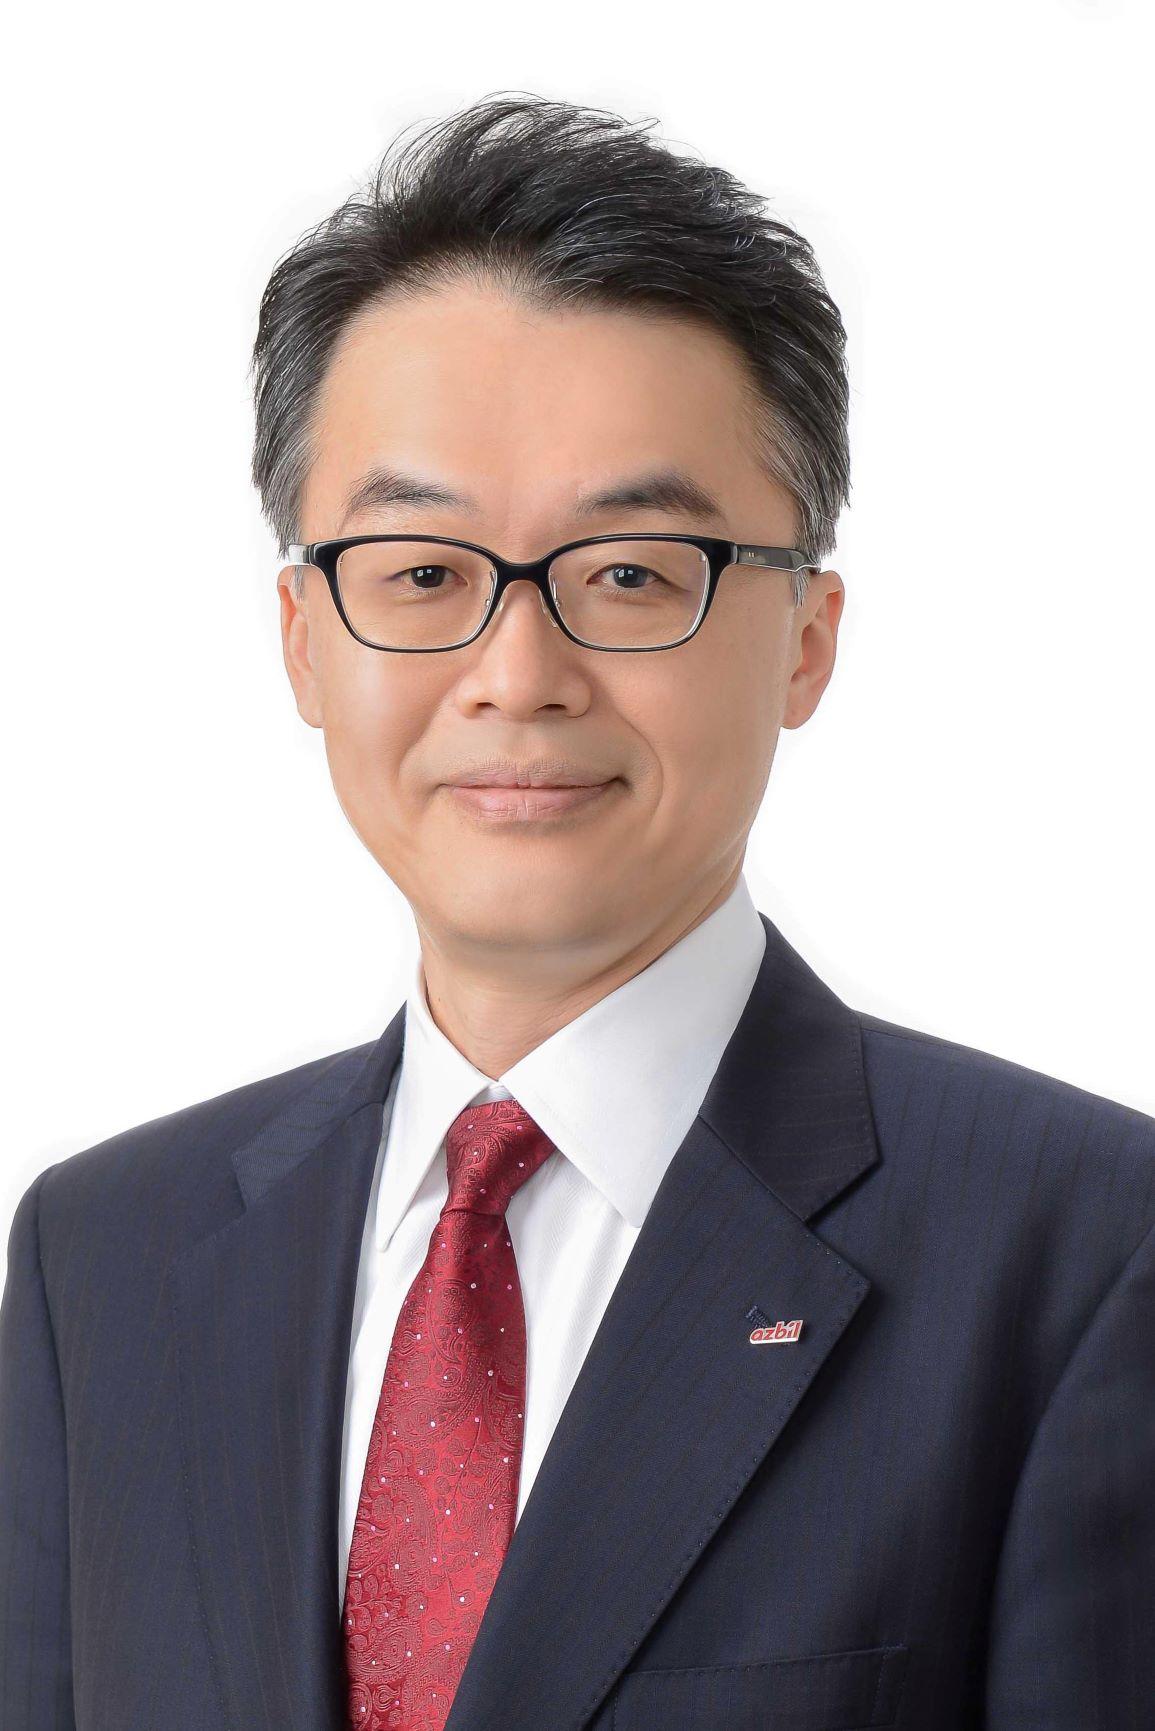 President and Group CEO Kiyohiro Yamamoto